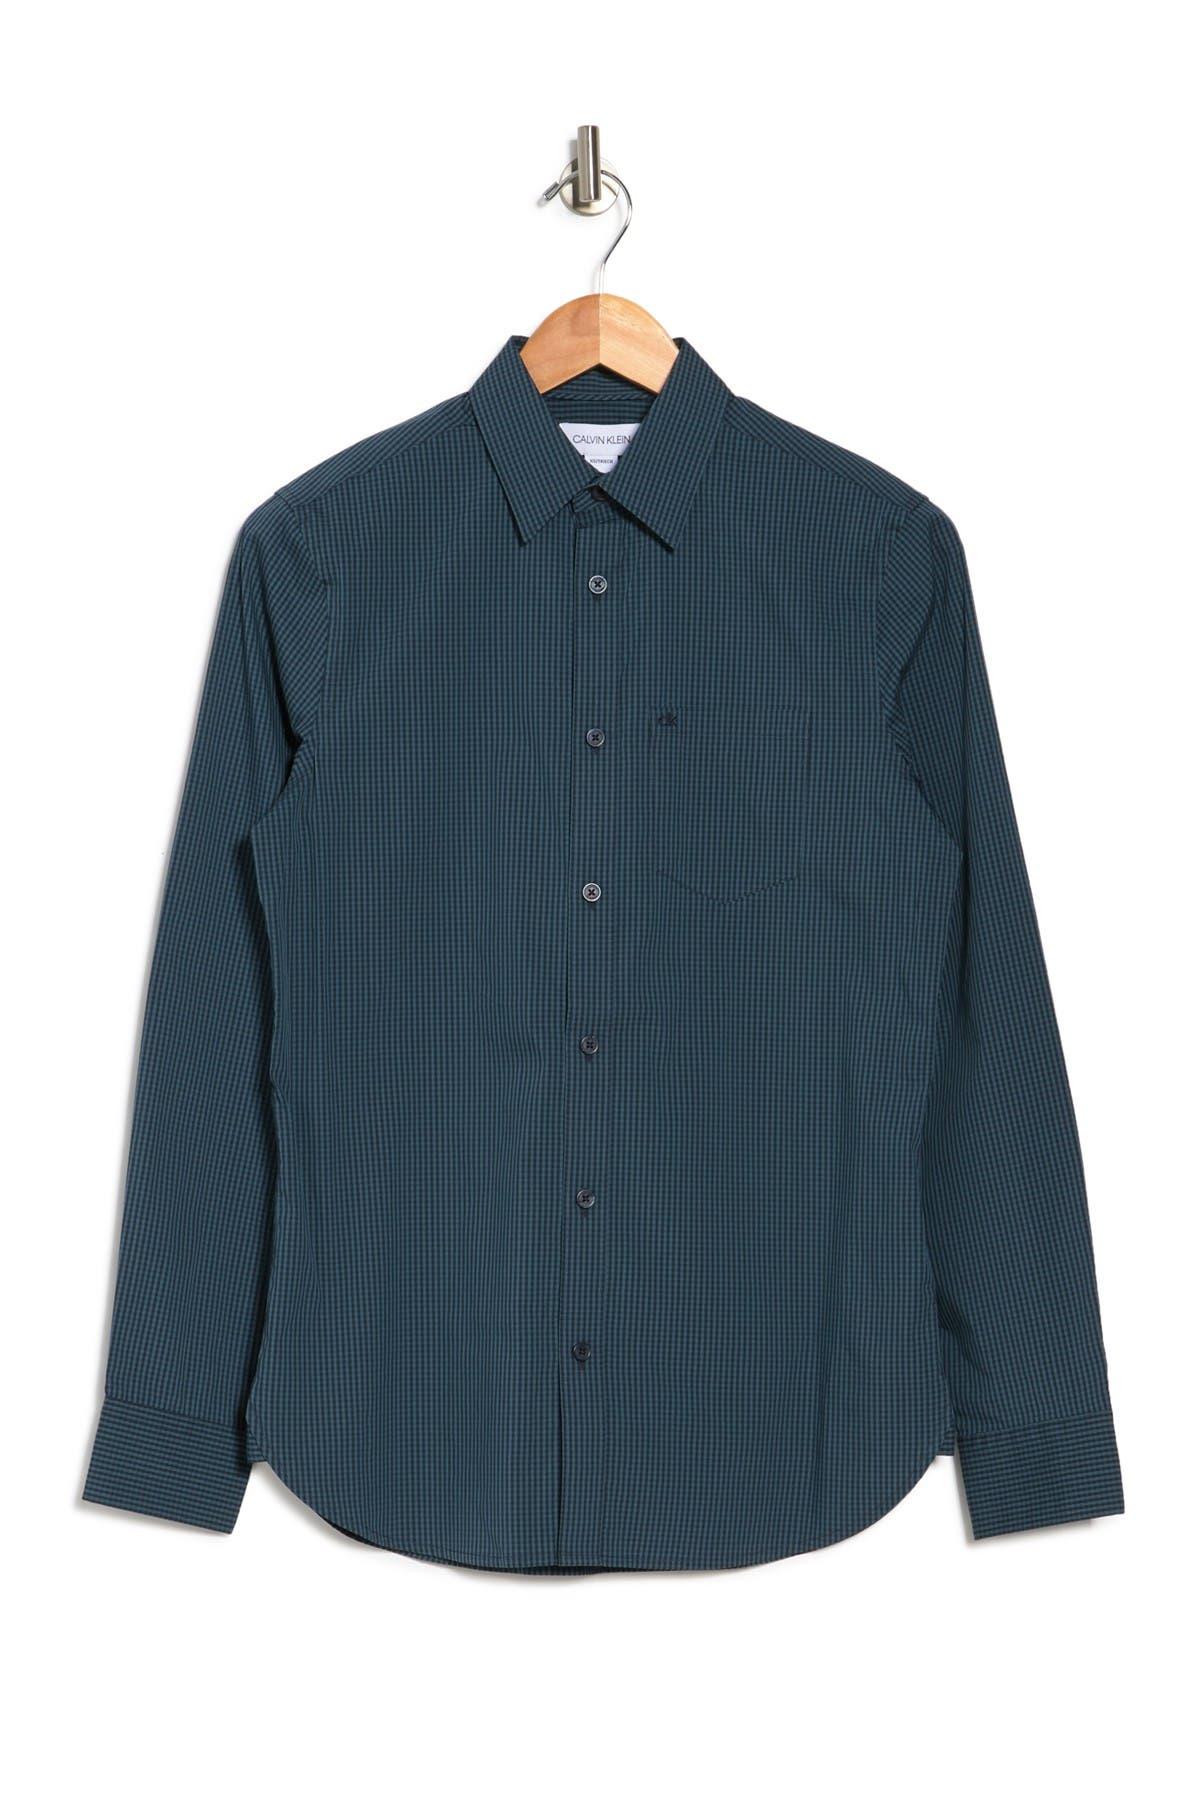 Image of Calvin Klein Micro Print Shirt